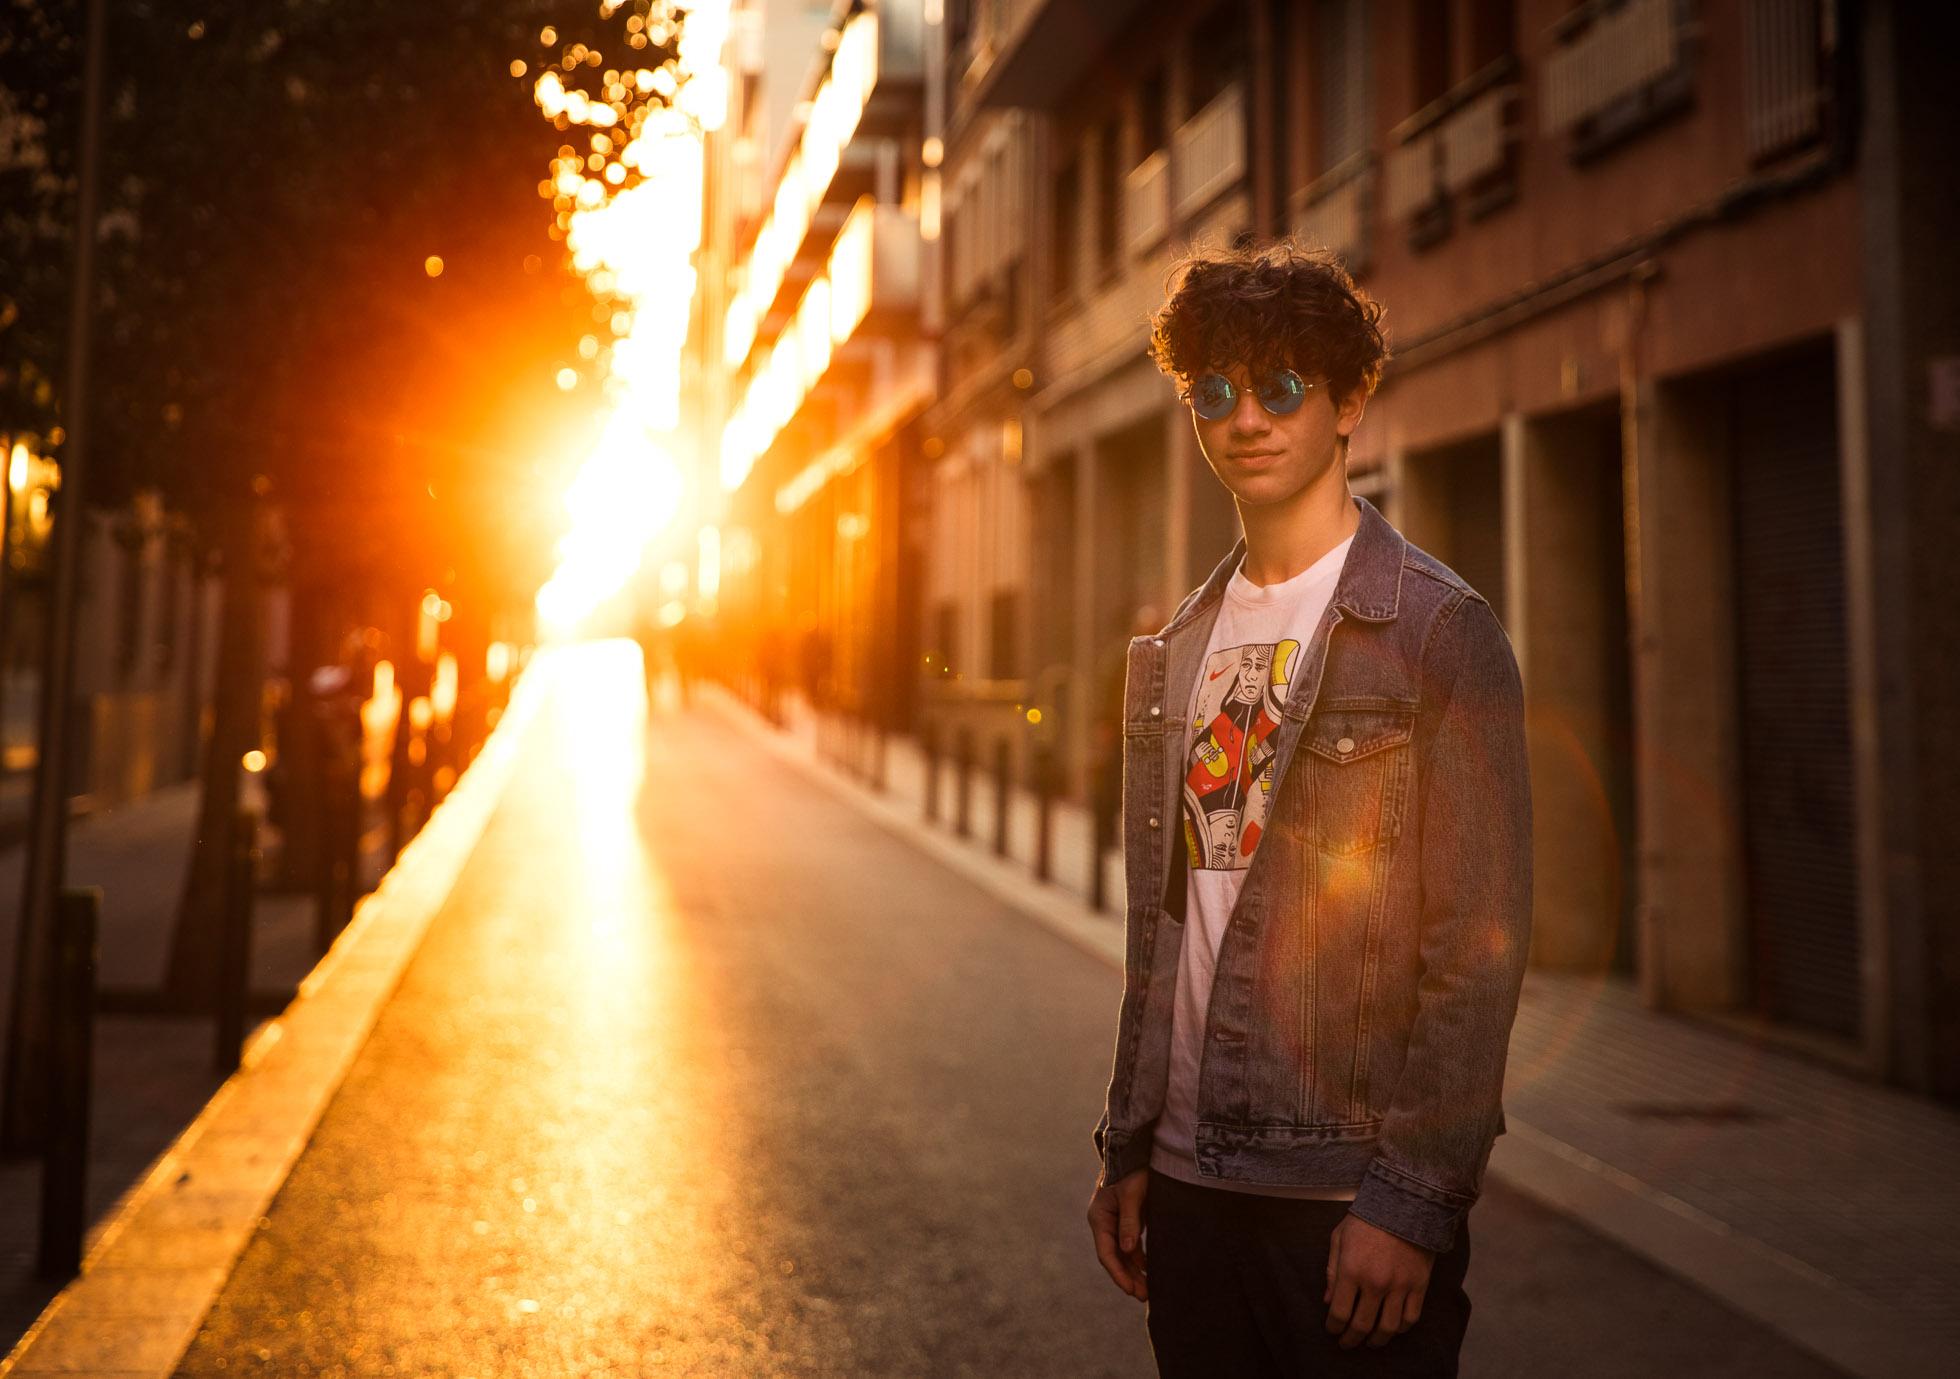 Senior photo on the streets of Barcelona